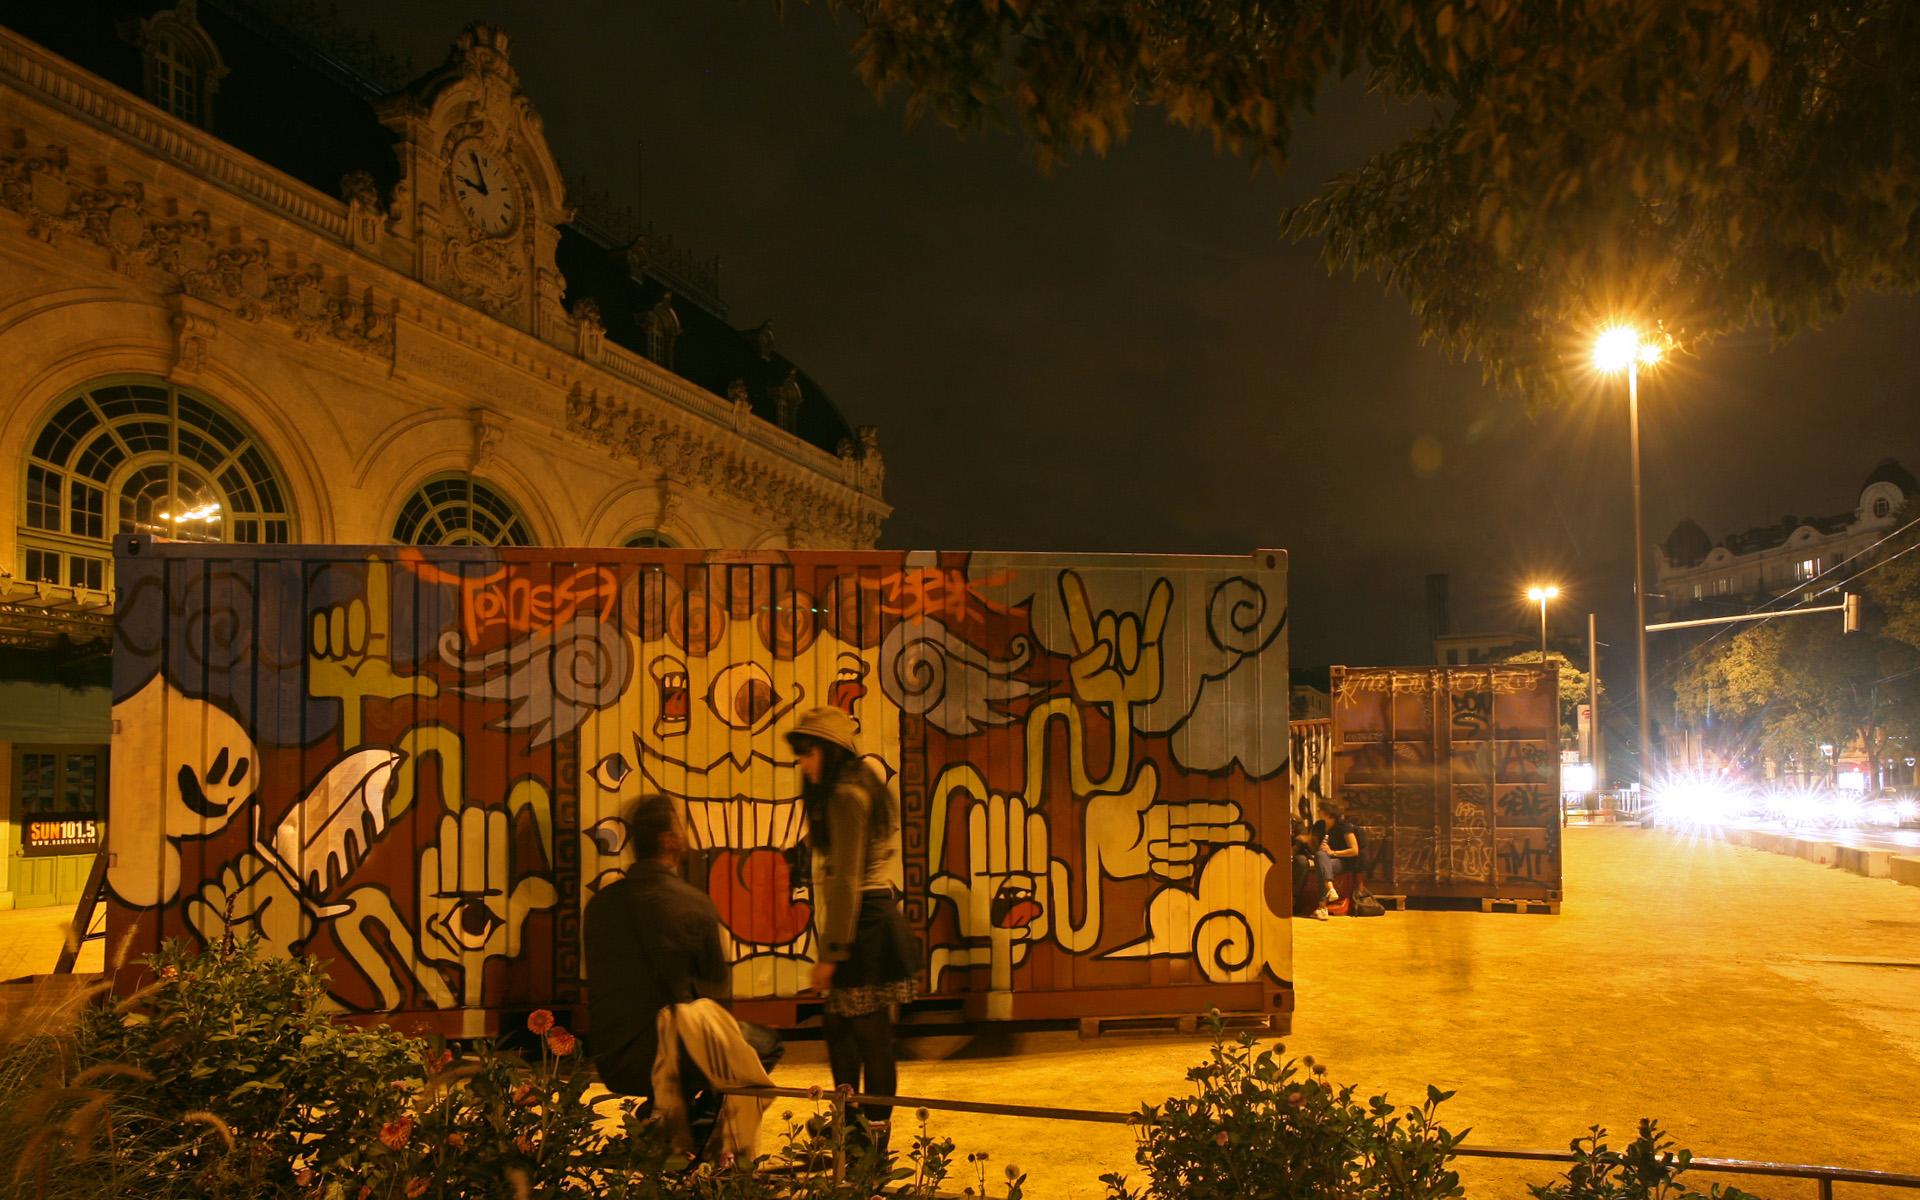 Graff-ik'Art - Aguttes - Toner 3BK - 2012